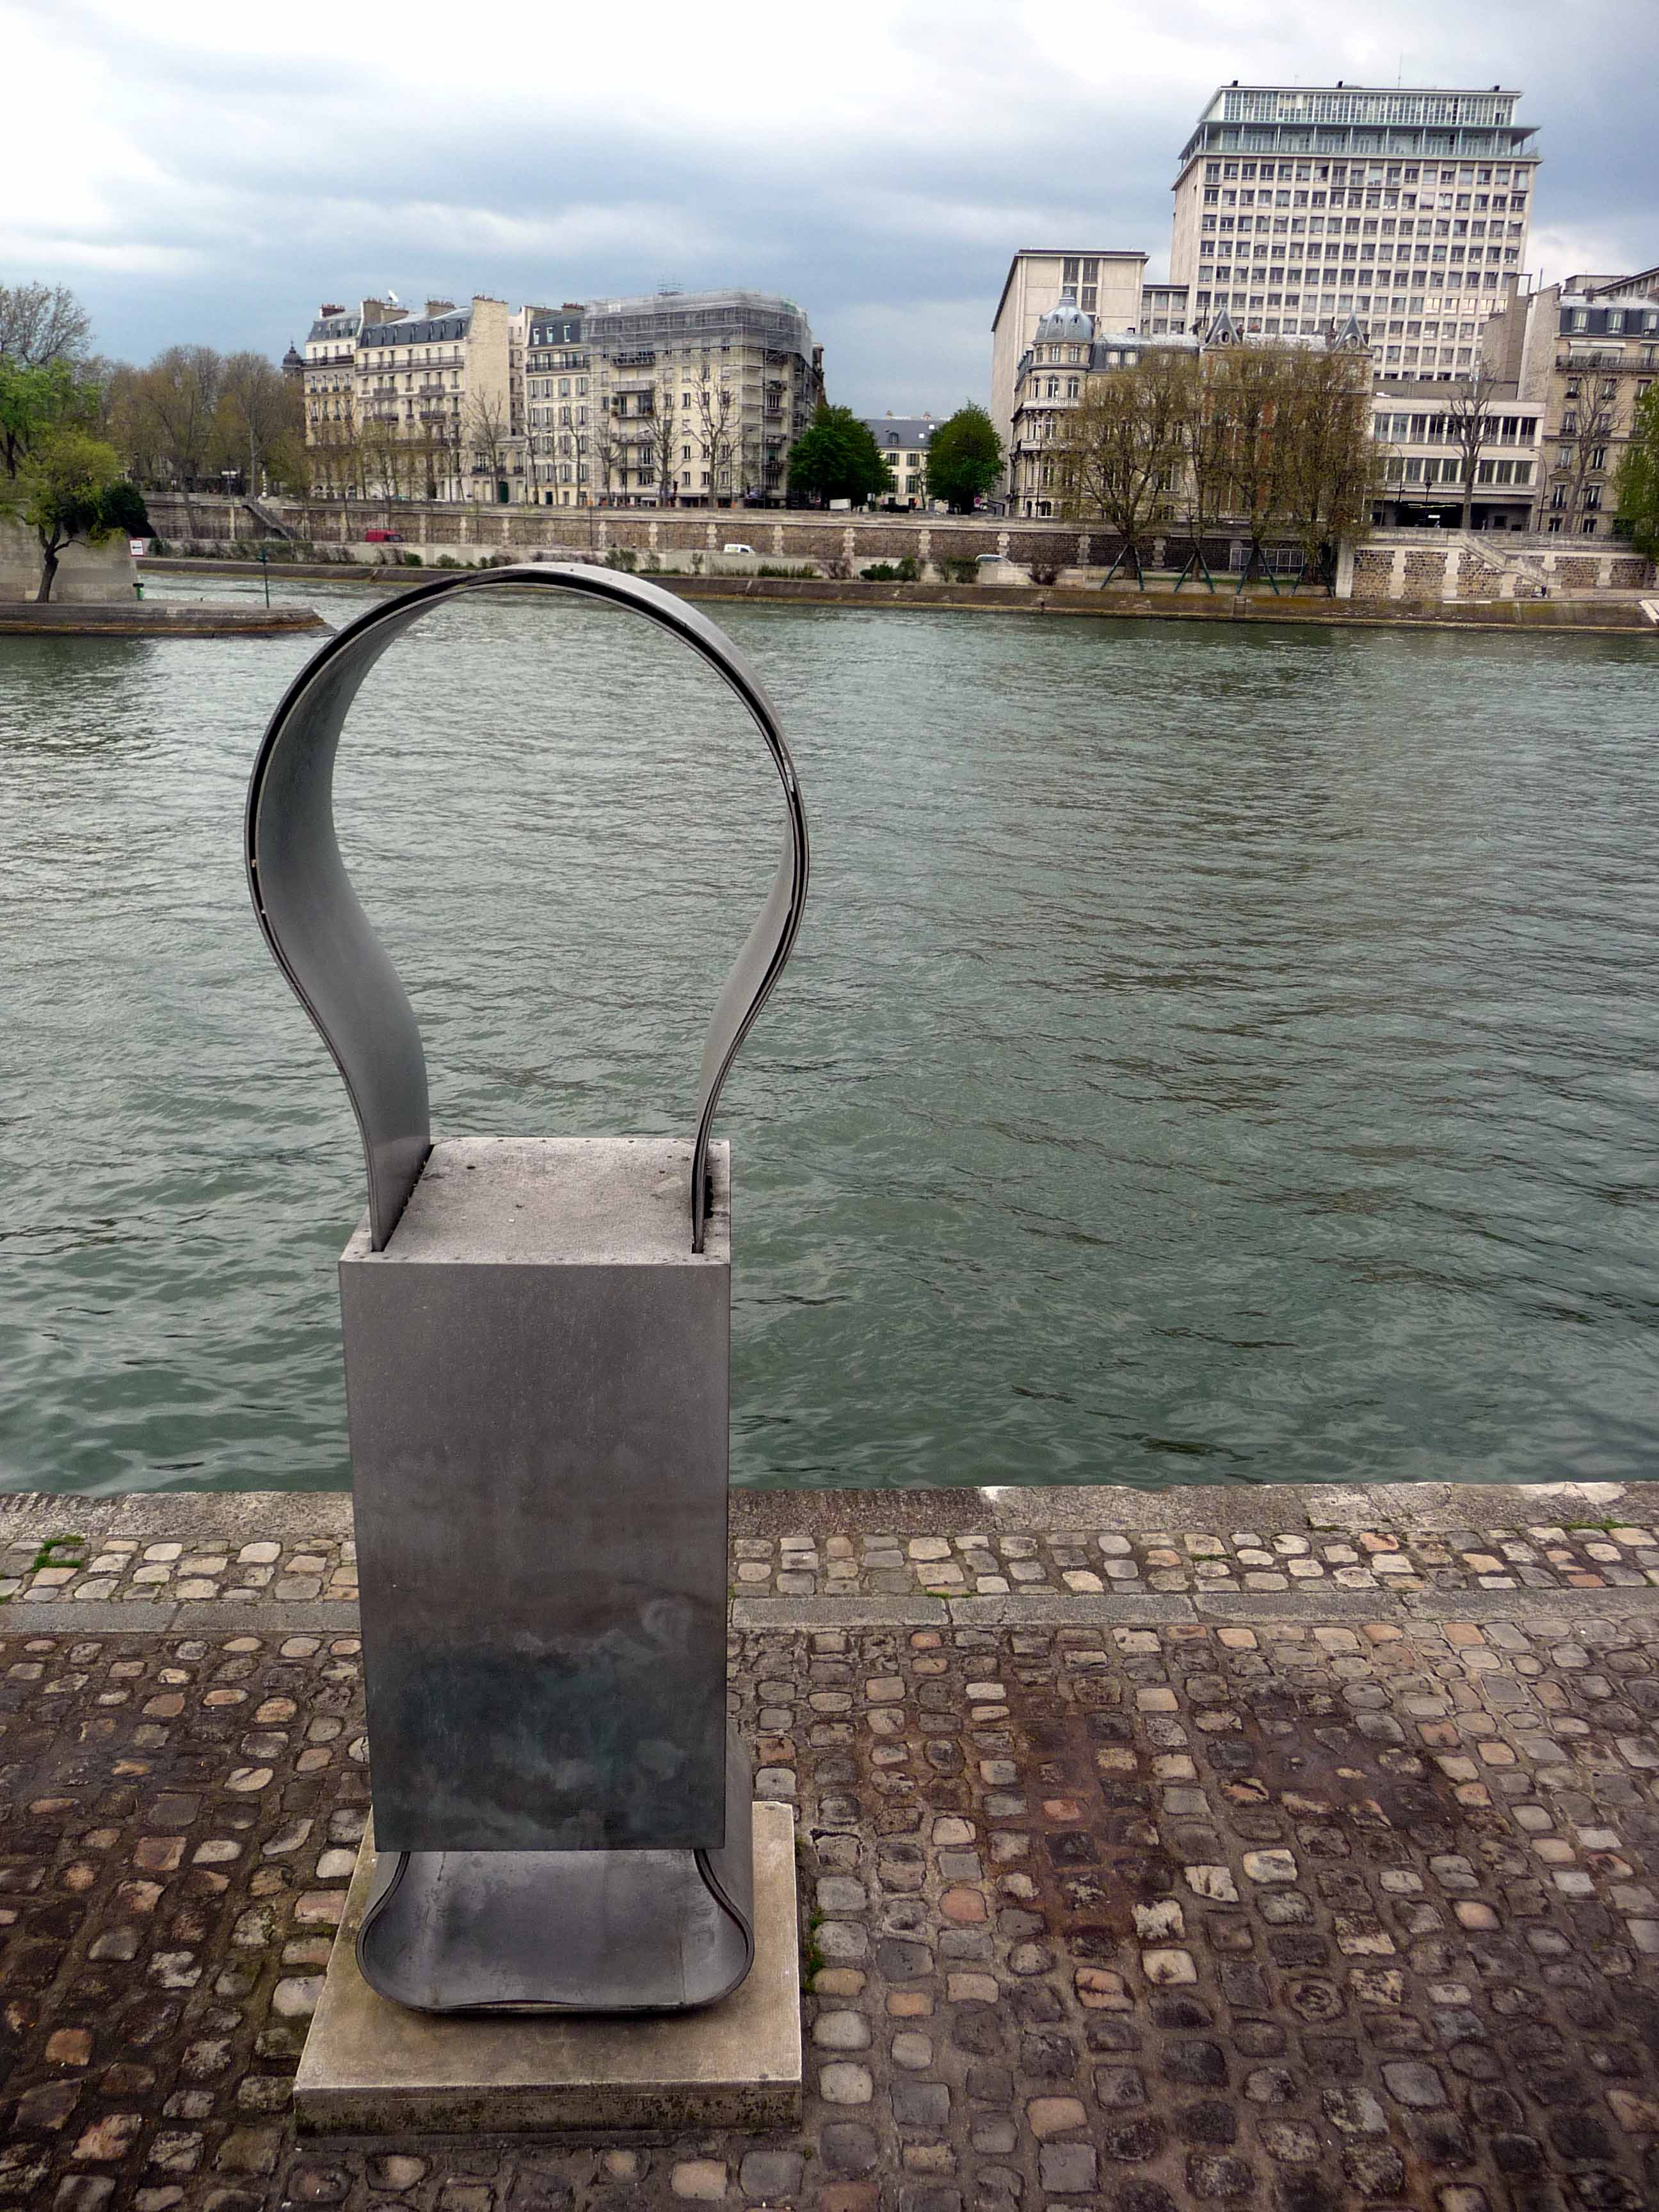 Musee sculpture en plein aire_by Drumaboy (https://www.flickr.com/photos/drumaboy/)